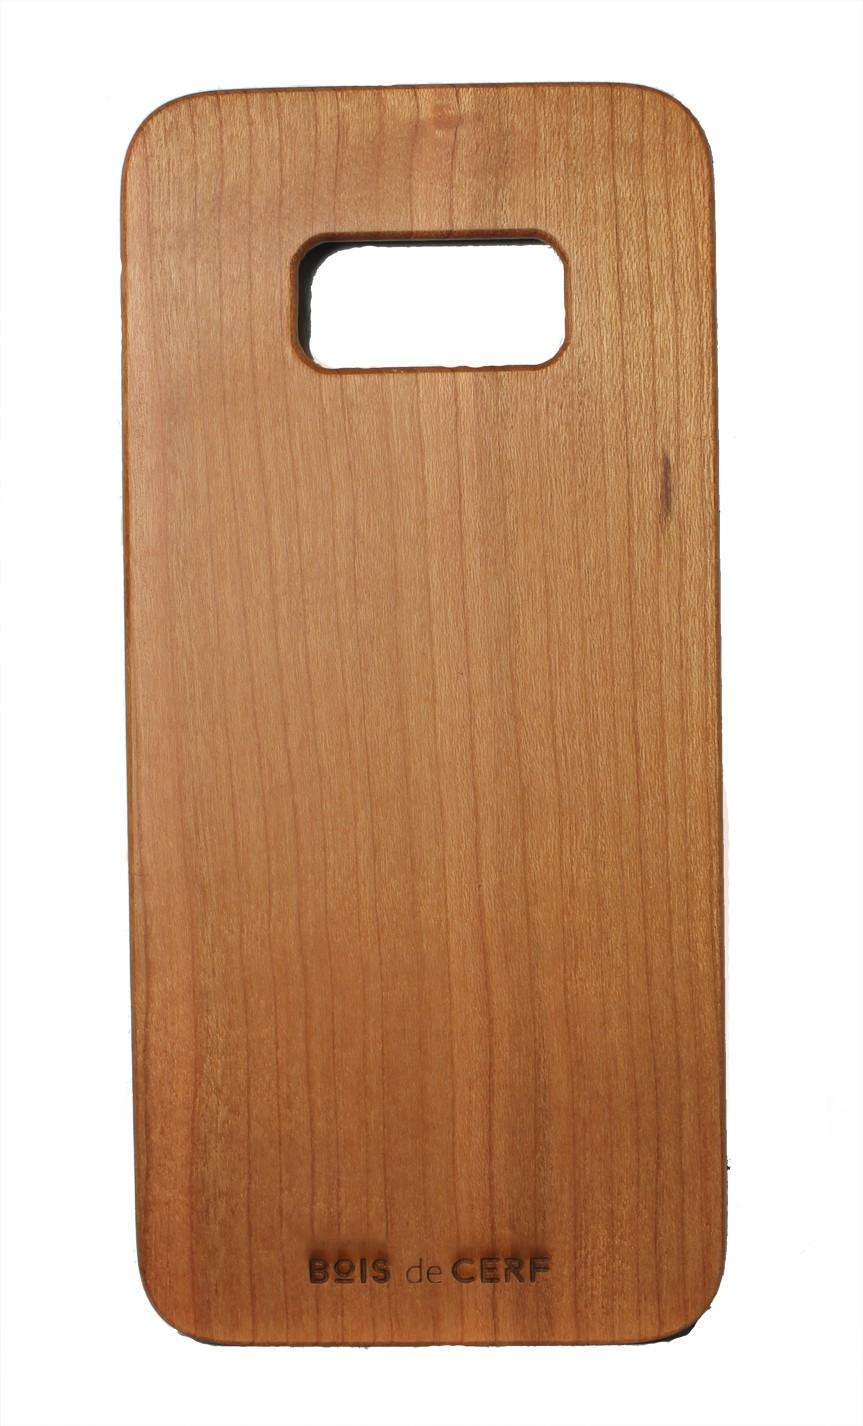 Coque bois Samsung Galaxy S8